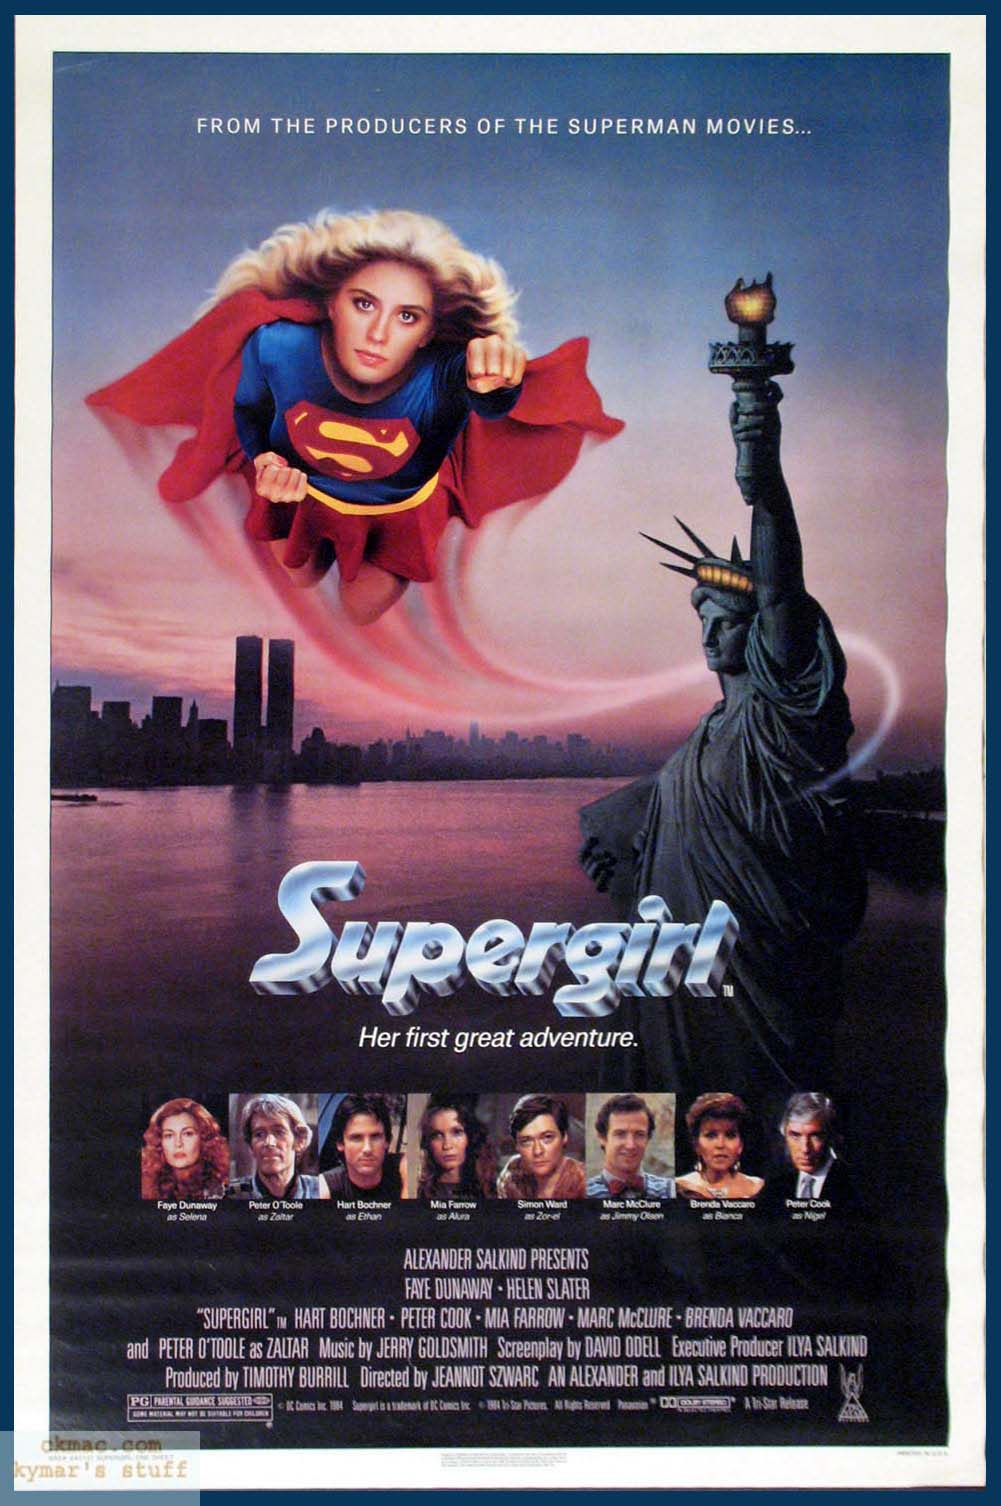 Superwoman Film